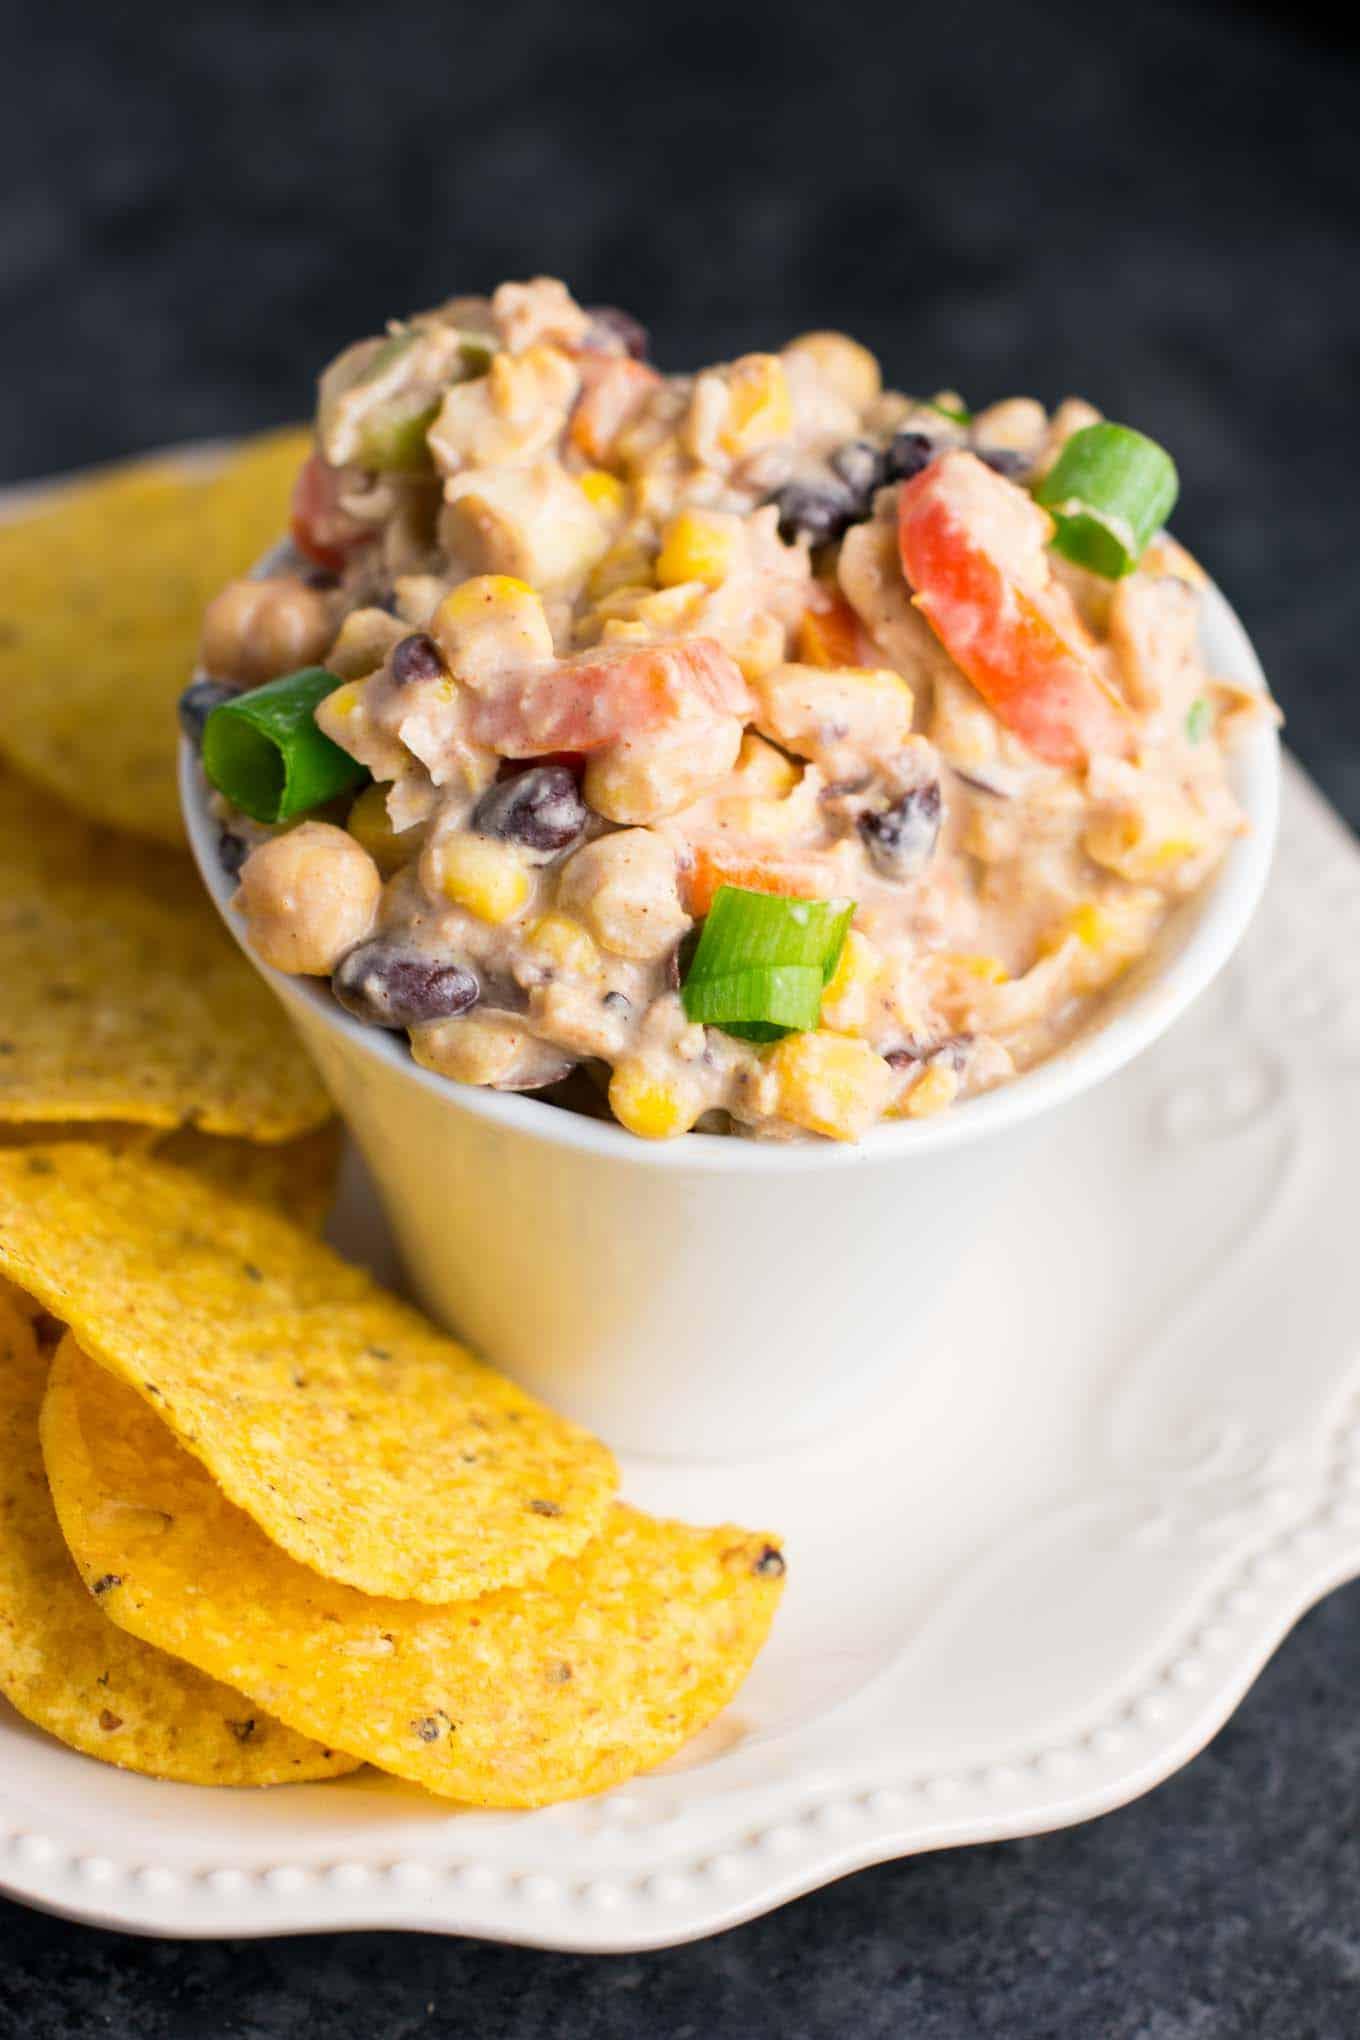 skinny mexican chickpea salad dip - recipe via @buildyourbite